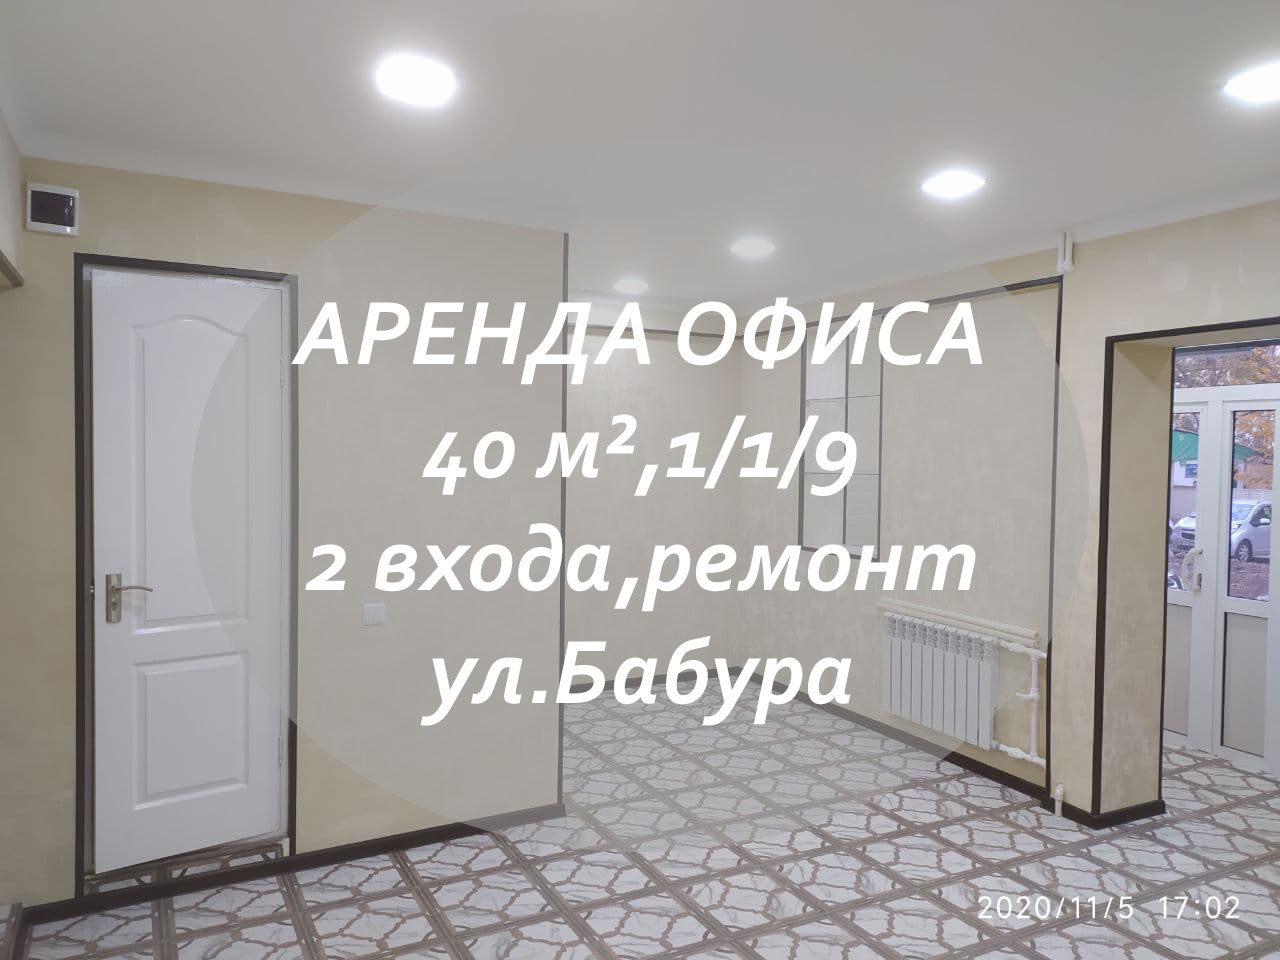 Снять в аренду офис 40 кв.м на ул.Бабура в Ташкенте